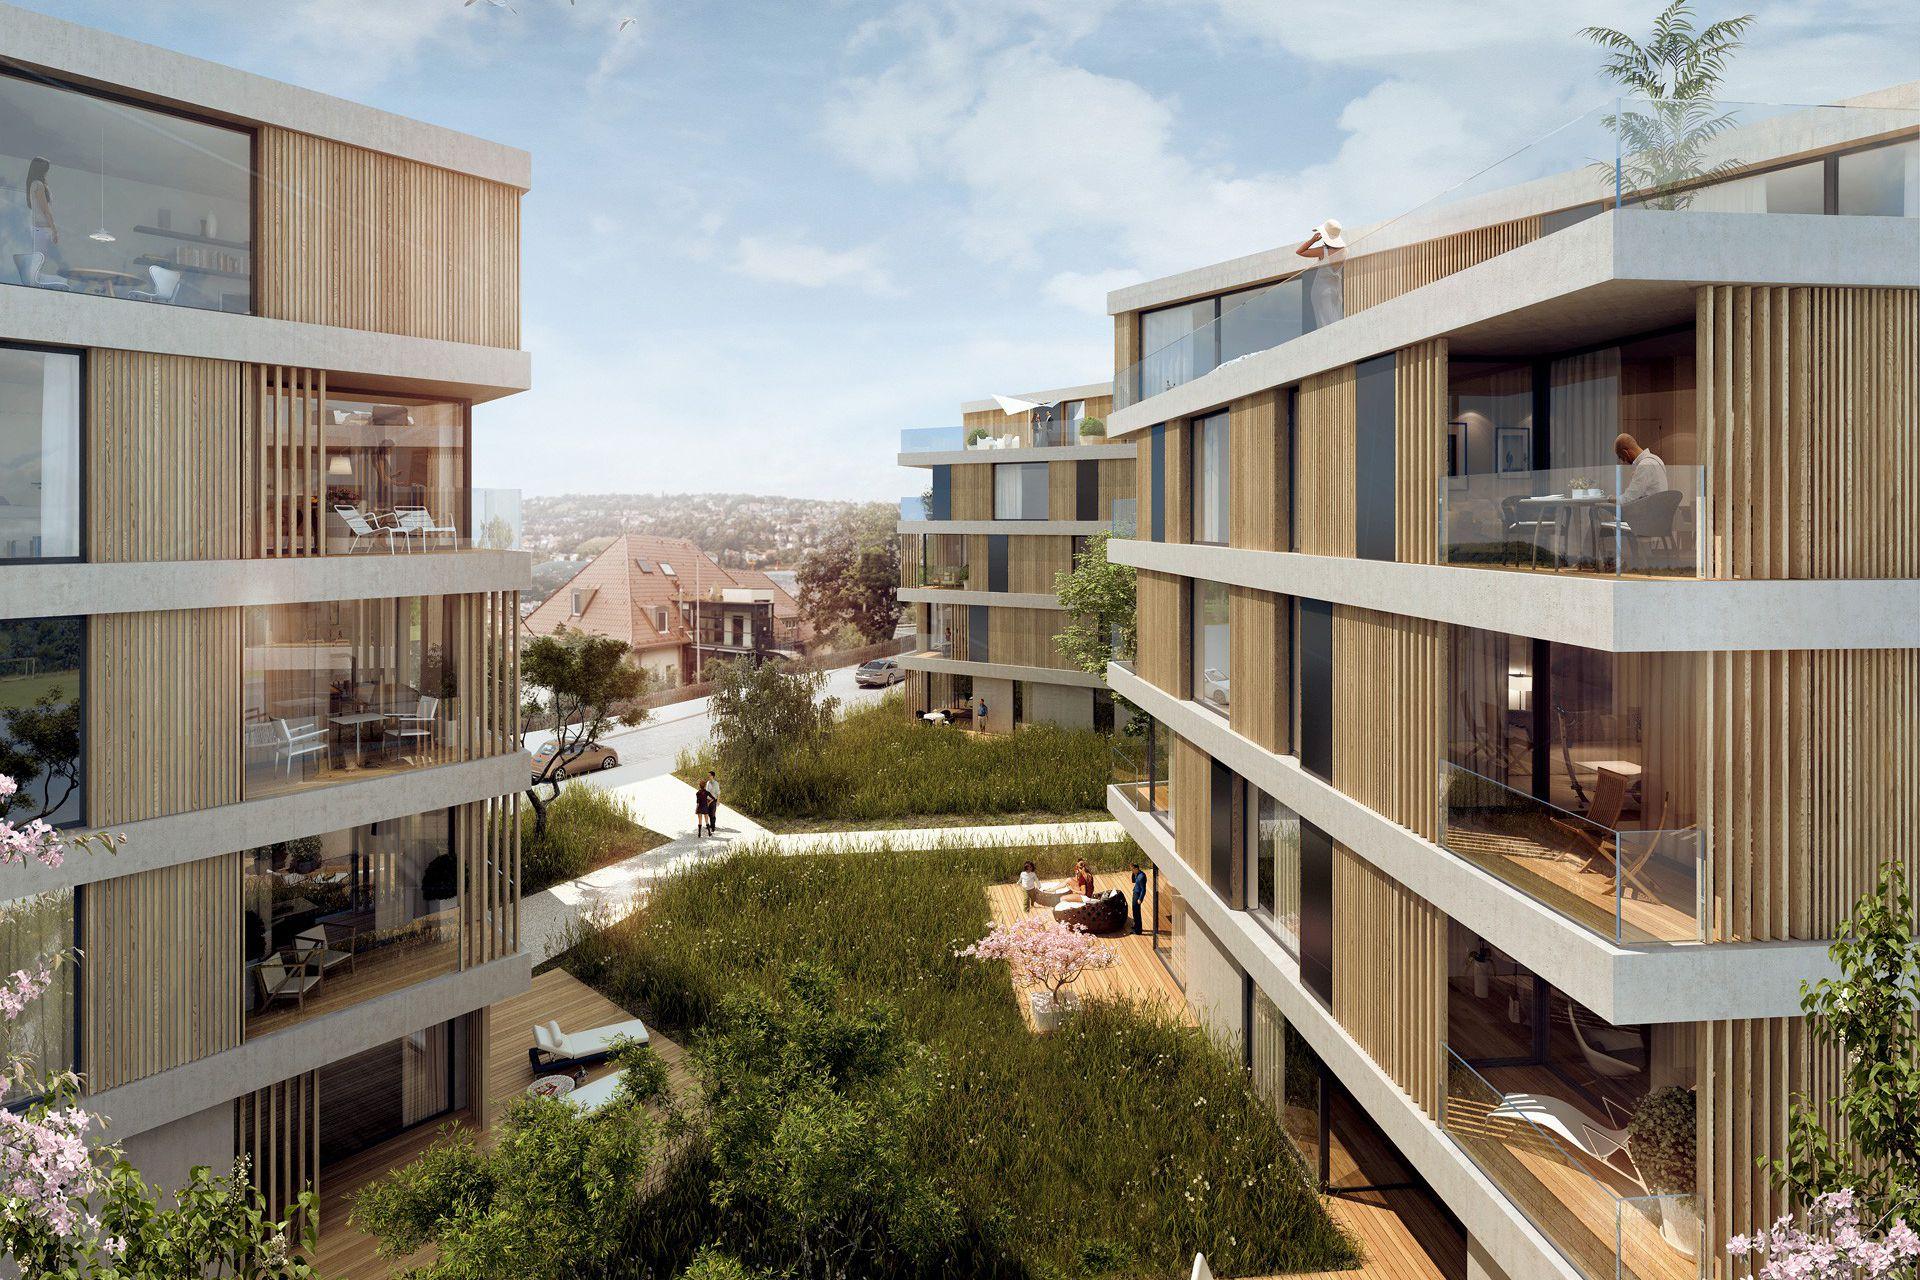 Architekturvisualisierung Stuttgart wohnhäuser stafflenbergstraße stuttgart konzept3d 3d